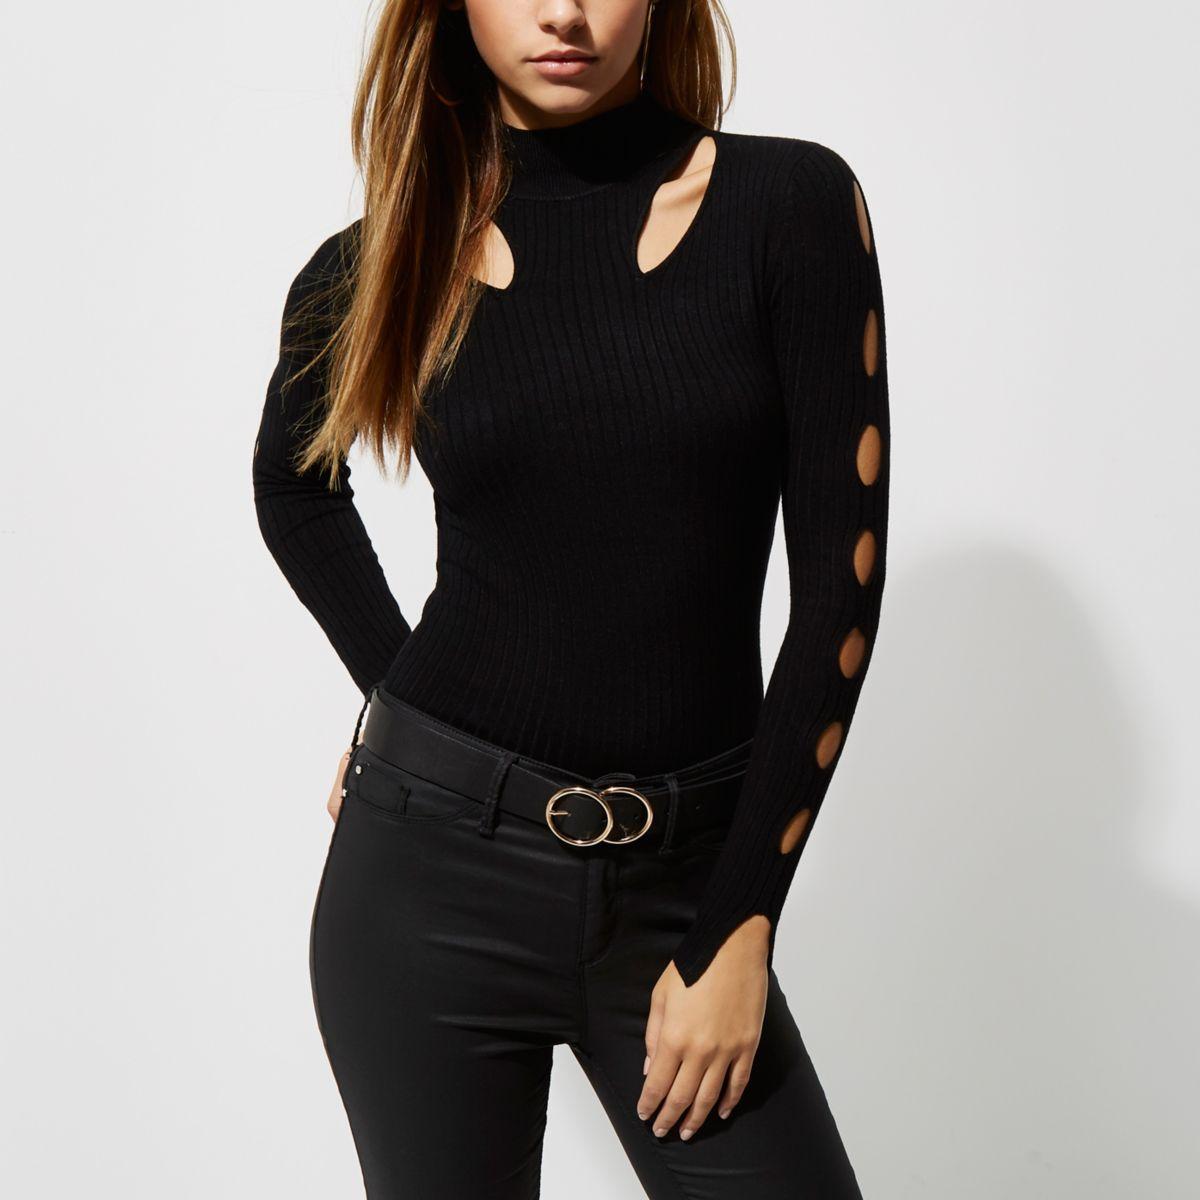 Black rib knit cut out high neck top